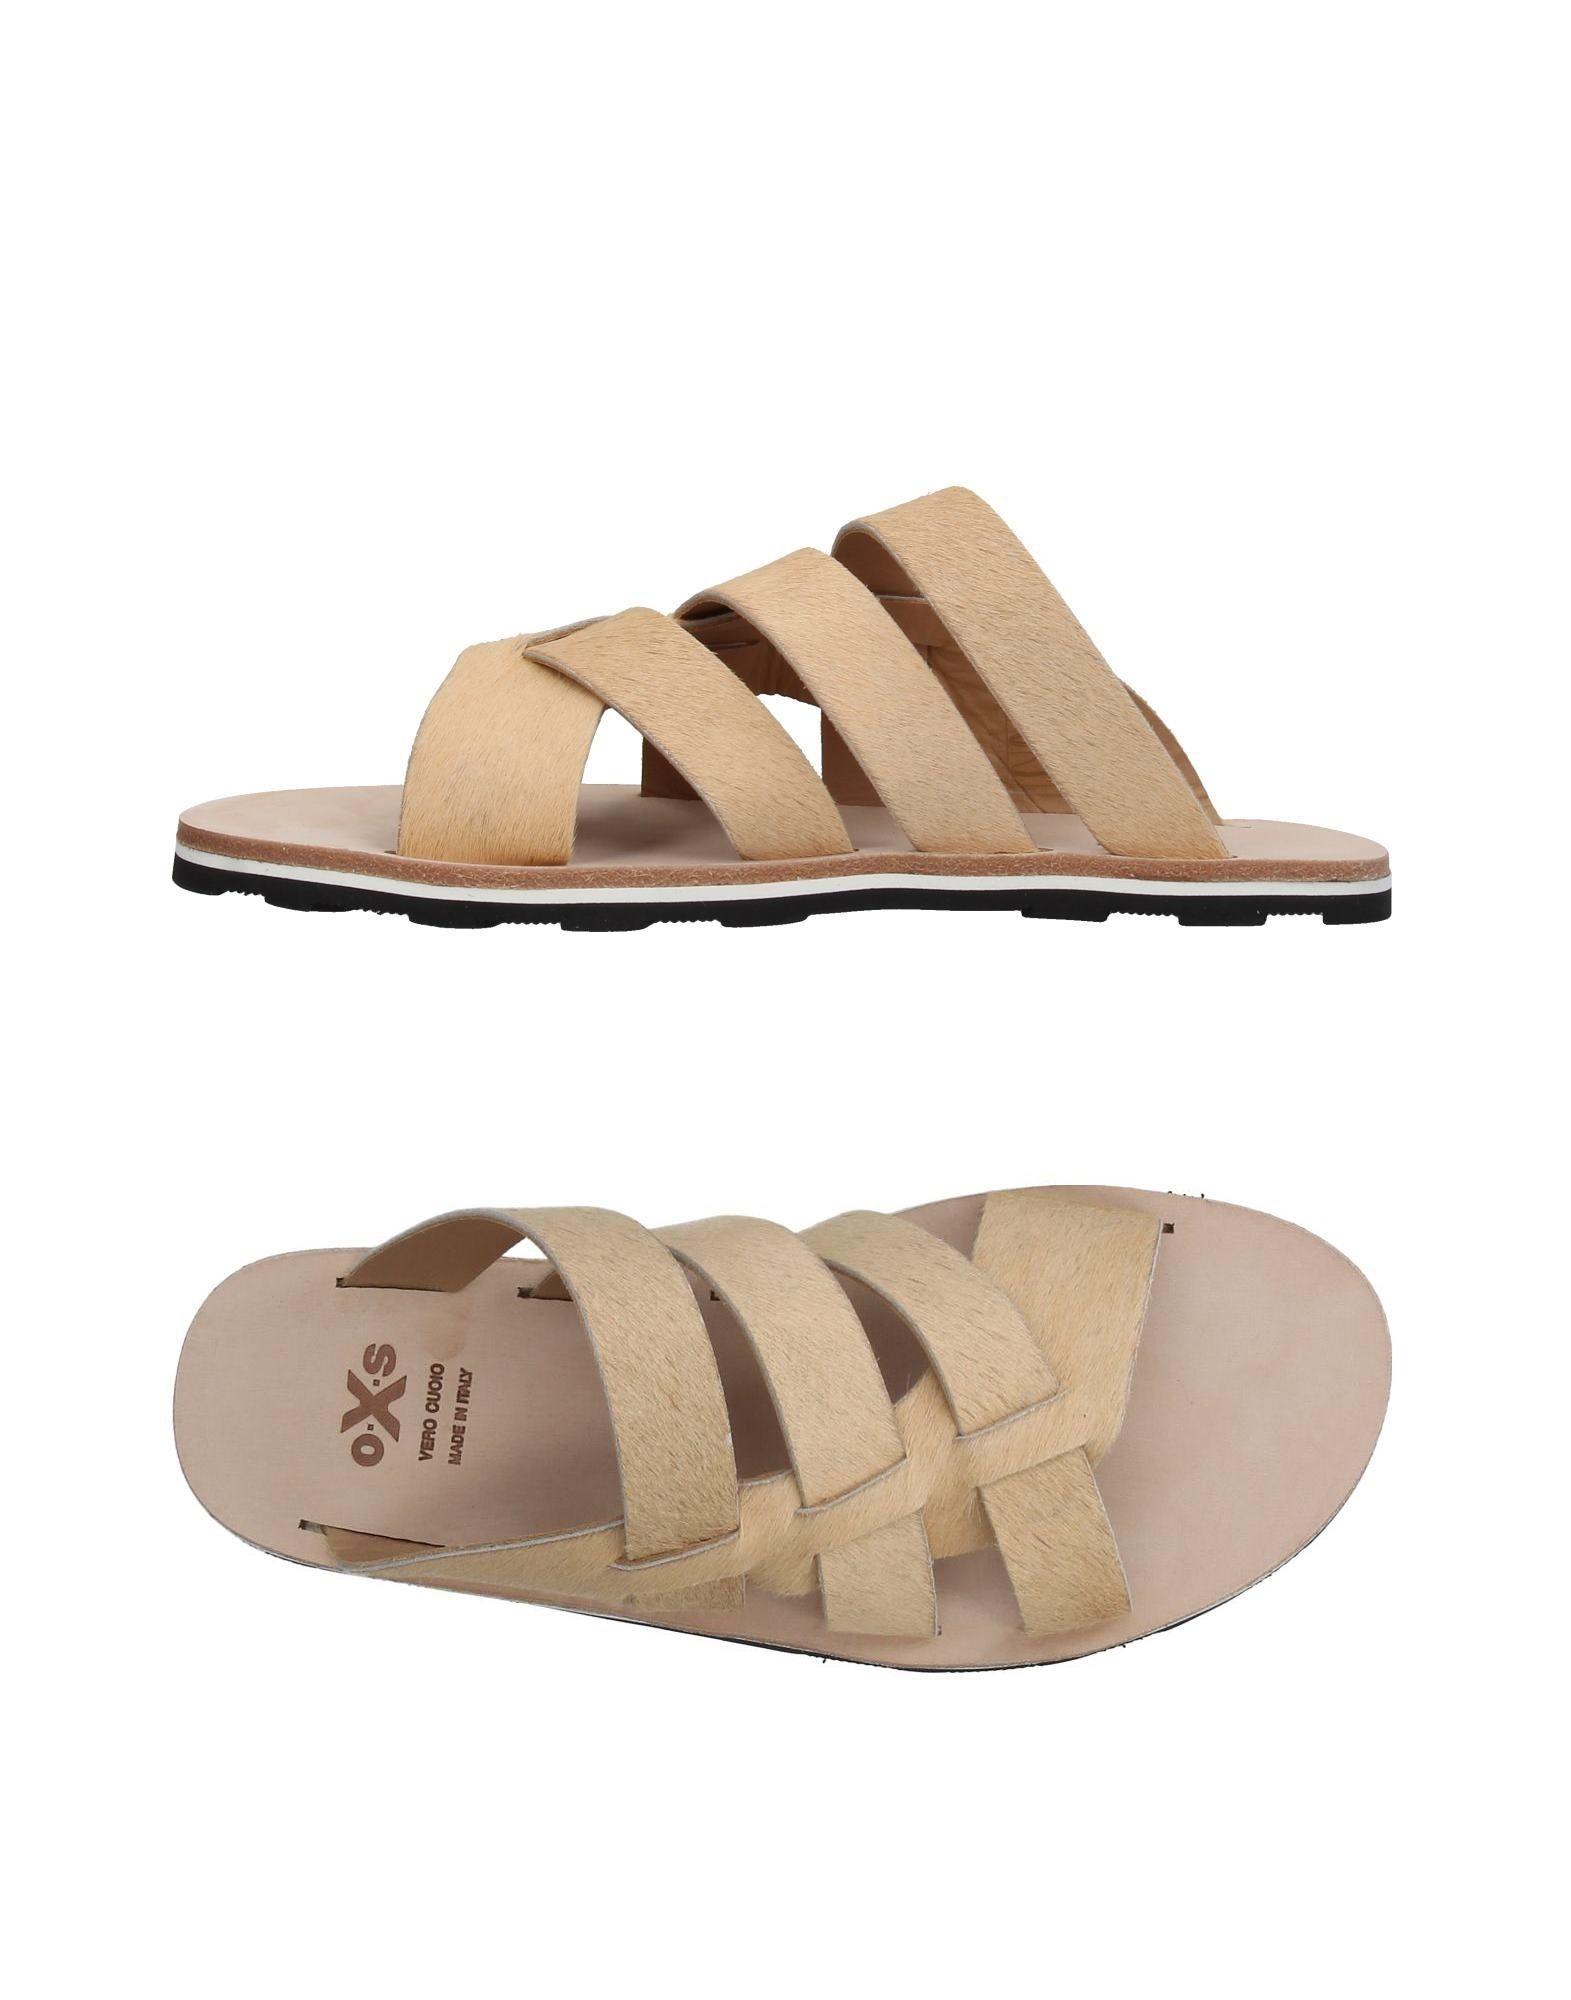 Haltbare Mode billige Schuhe O.X.S. Sandalen Damen  11355175QS Heiße Schuhe